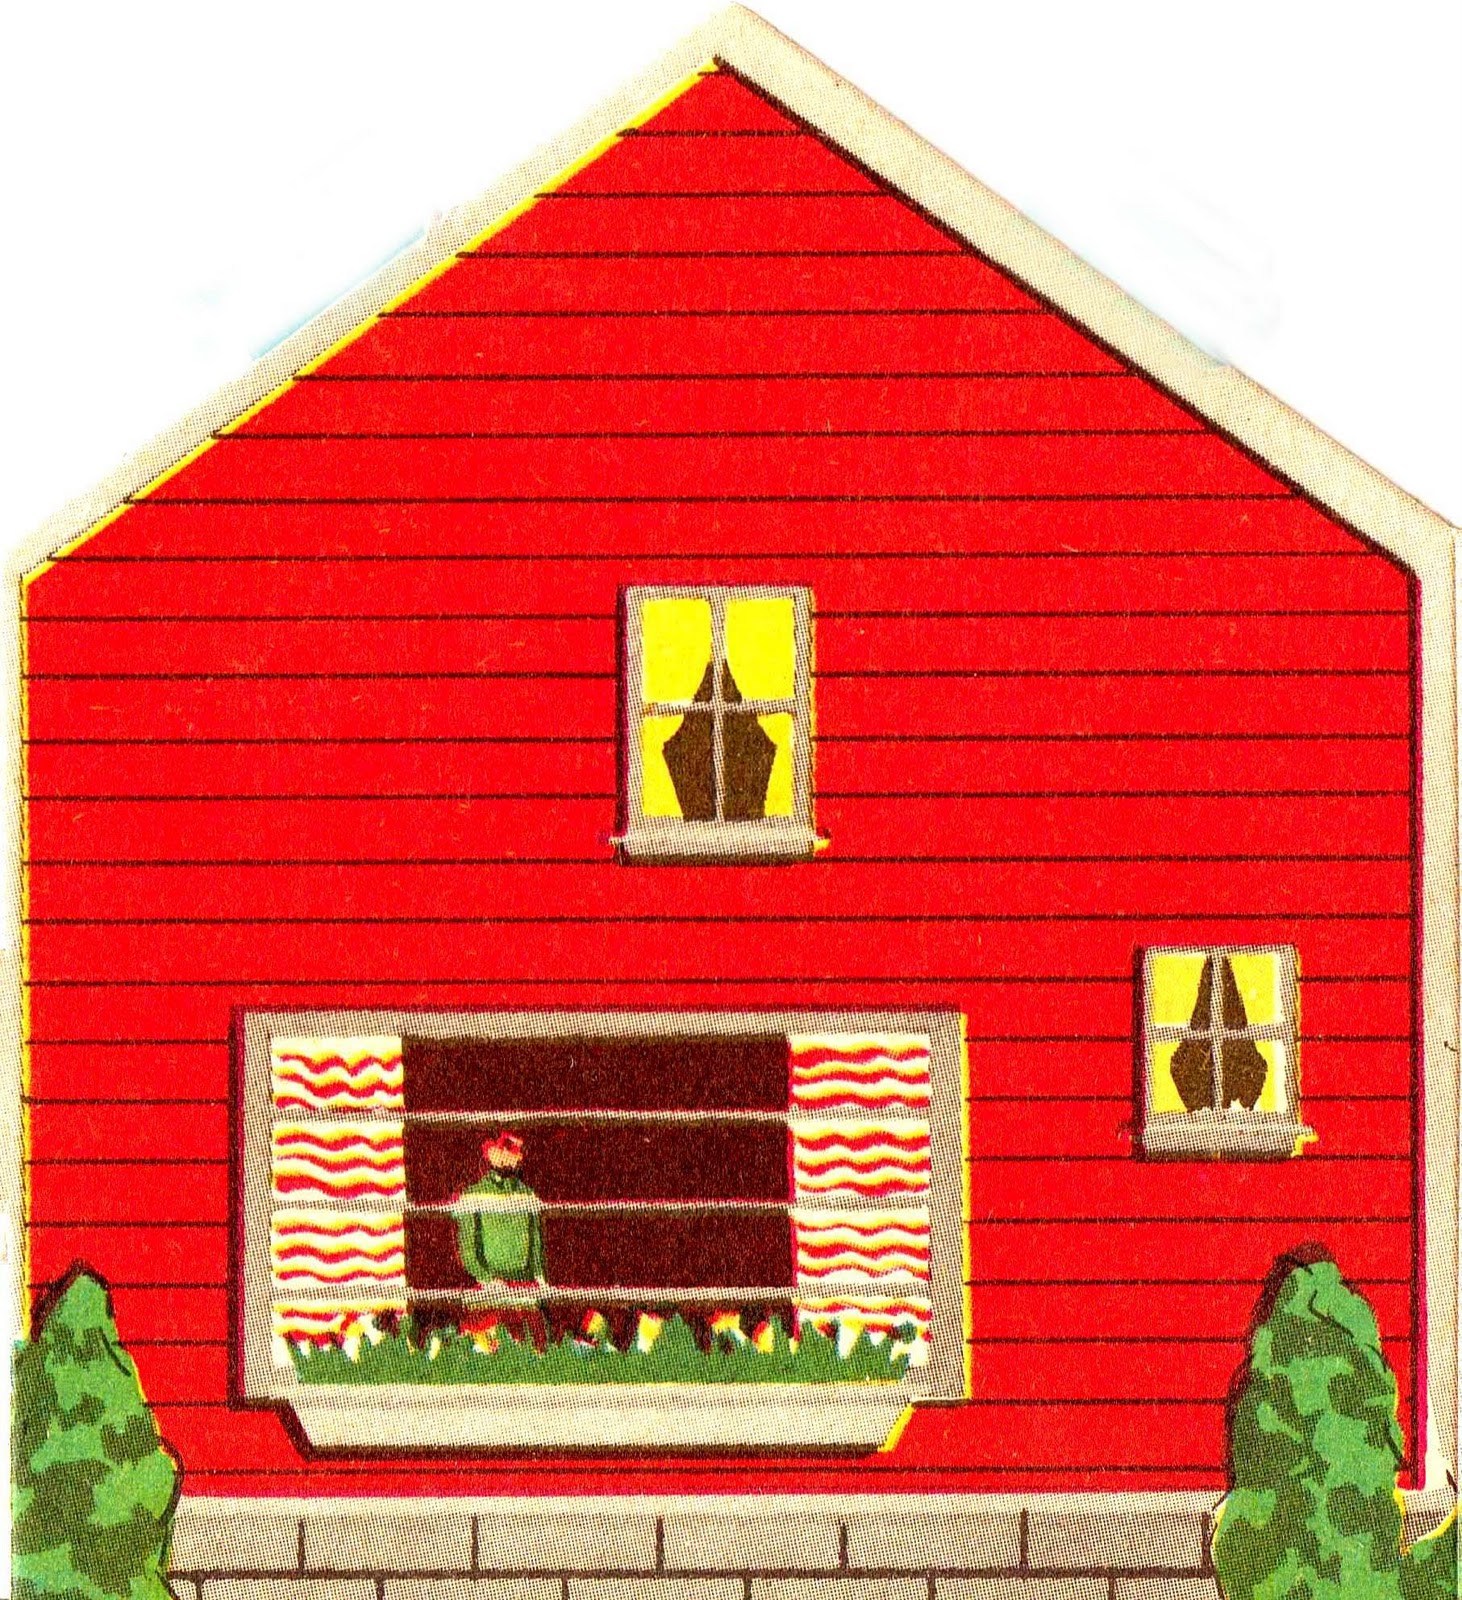 http://4.bp.blogspot.com/_jCRKMkmuxY0/TUGHwTCSRjI/AAAAAAAAA6M/ELNWOeev55U/s1600/2+Story+House+Walls+1+enhanced.jpg